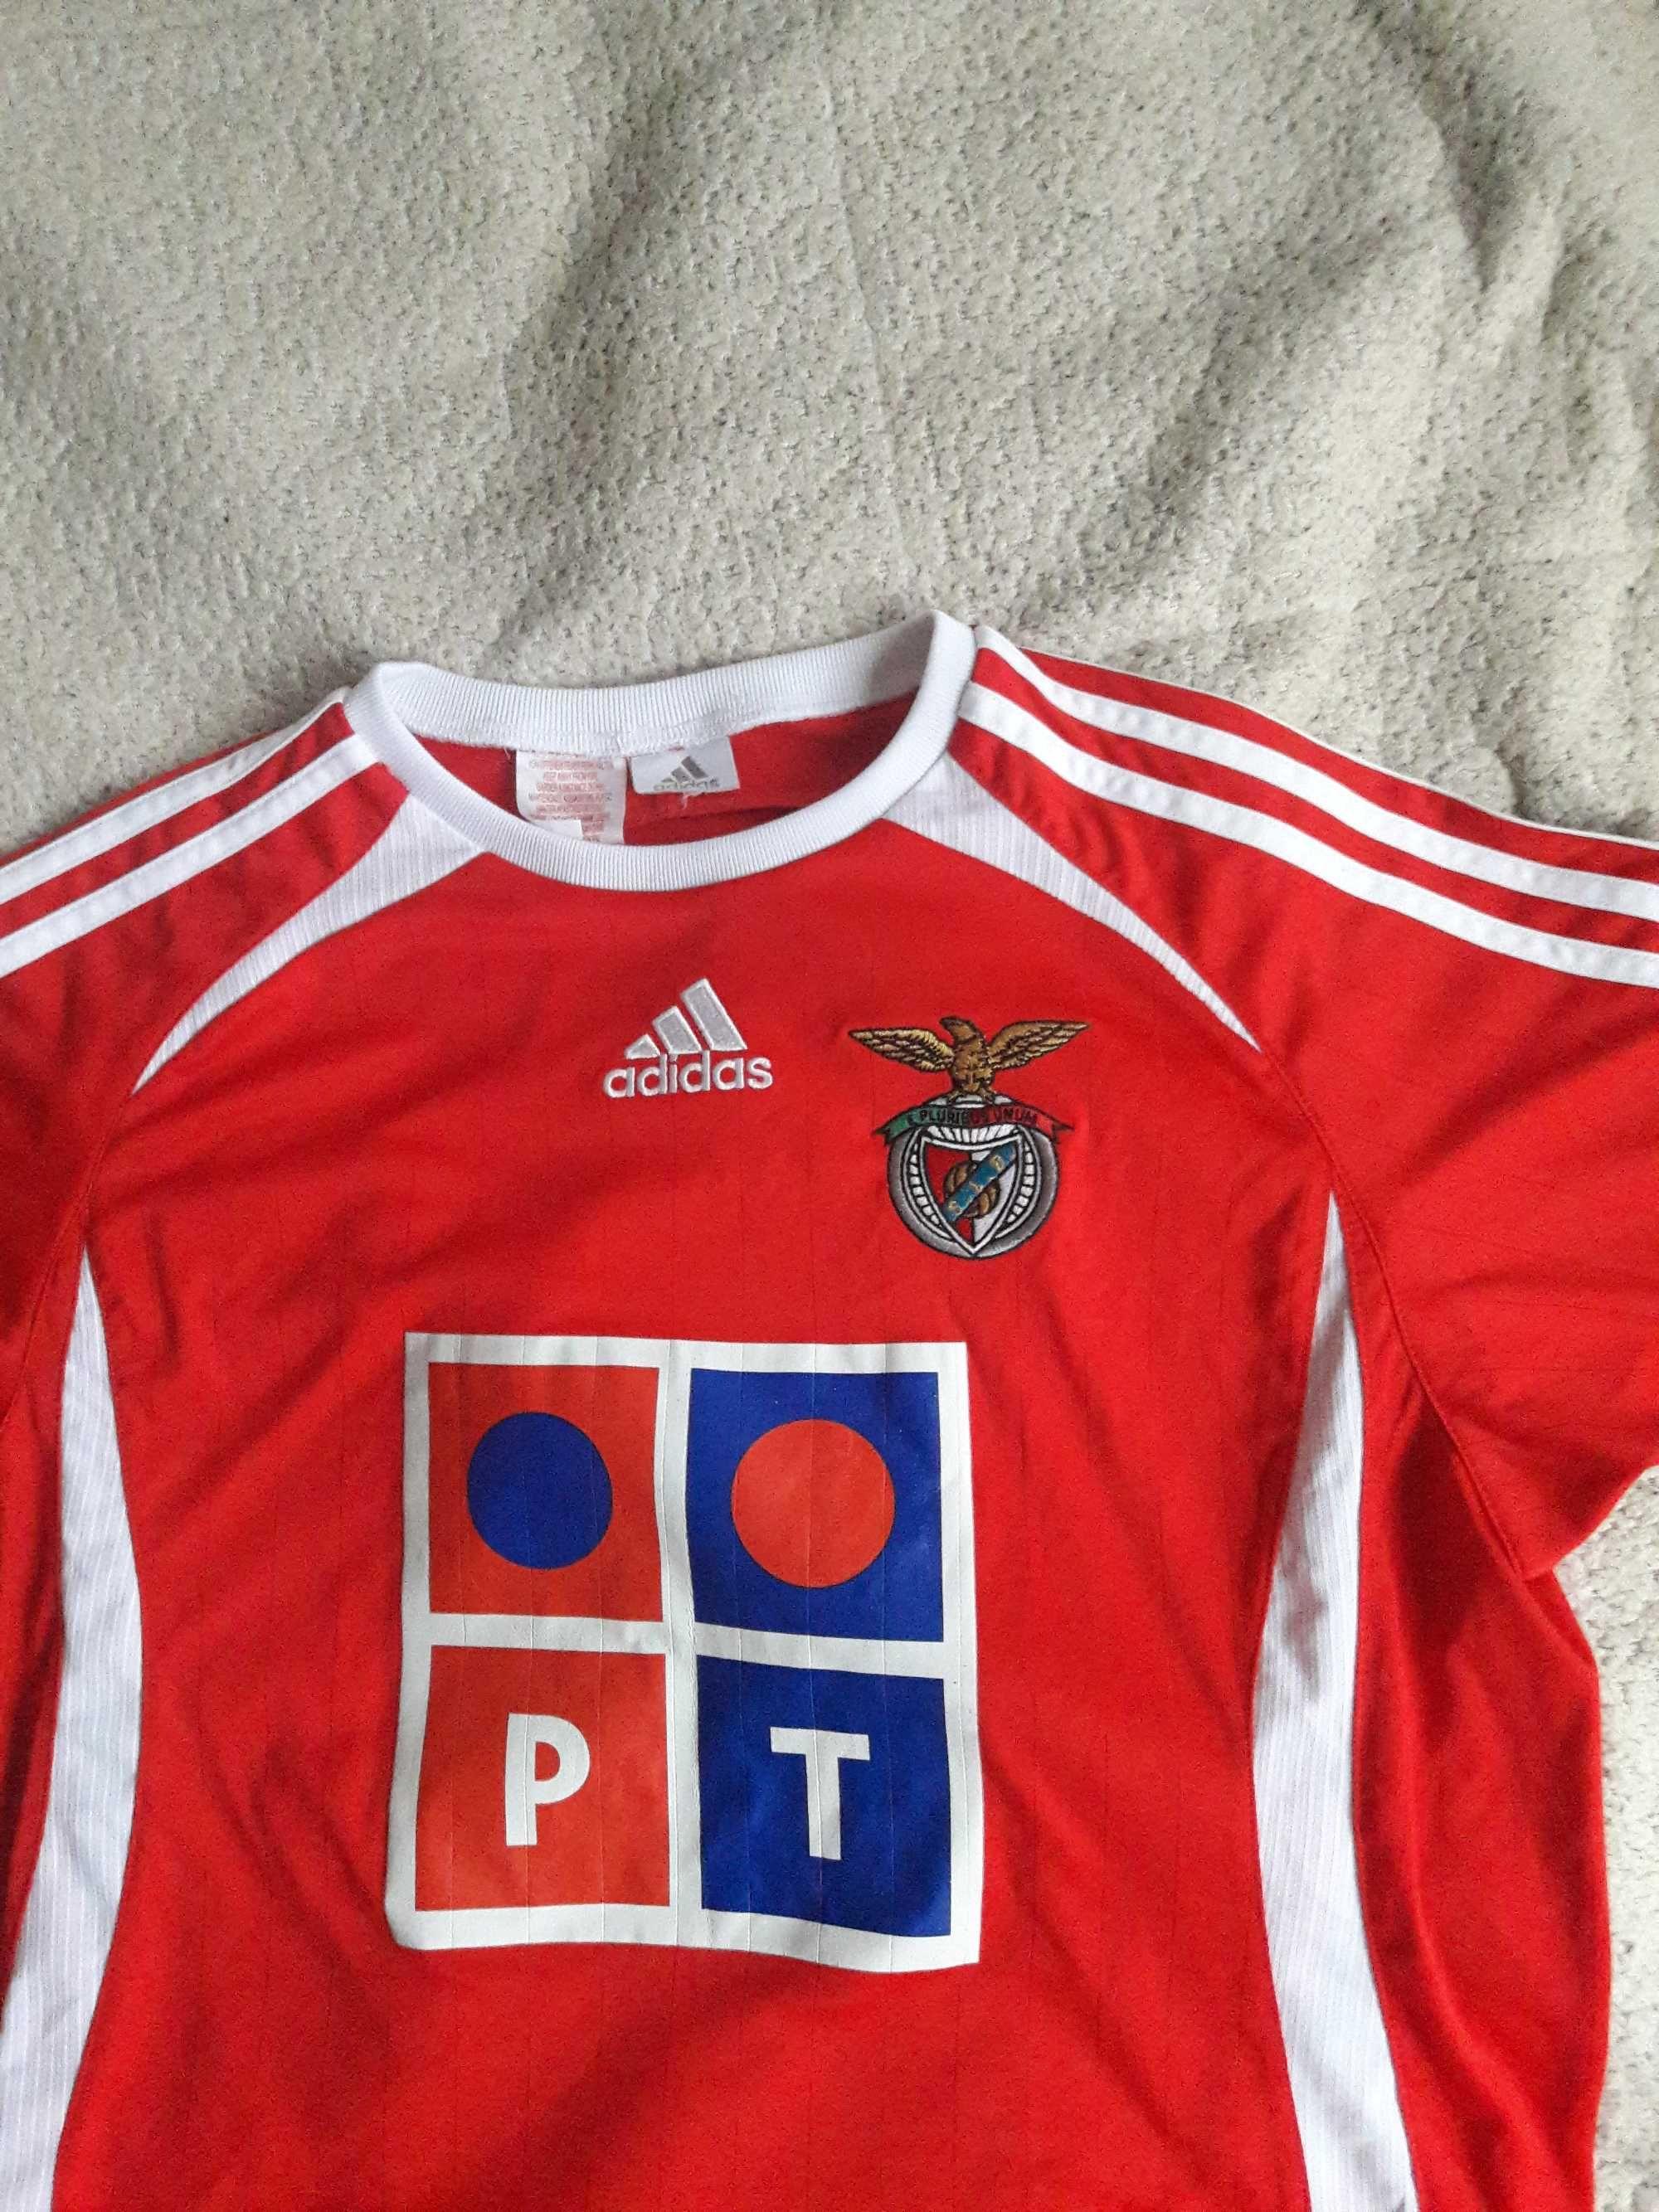 Camisola SL Benfica vintage